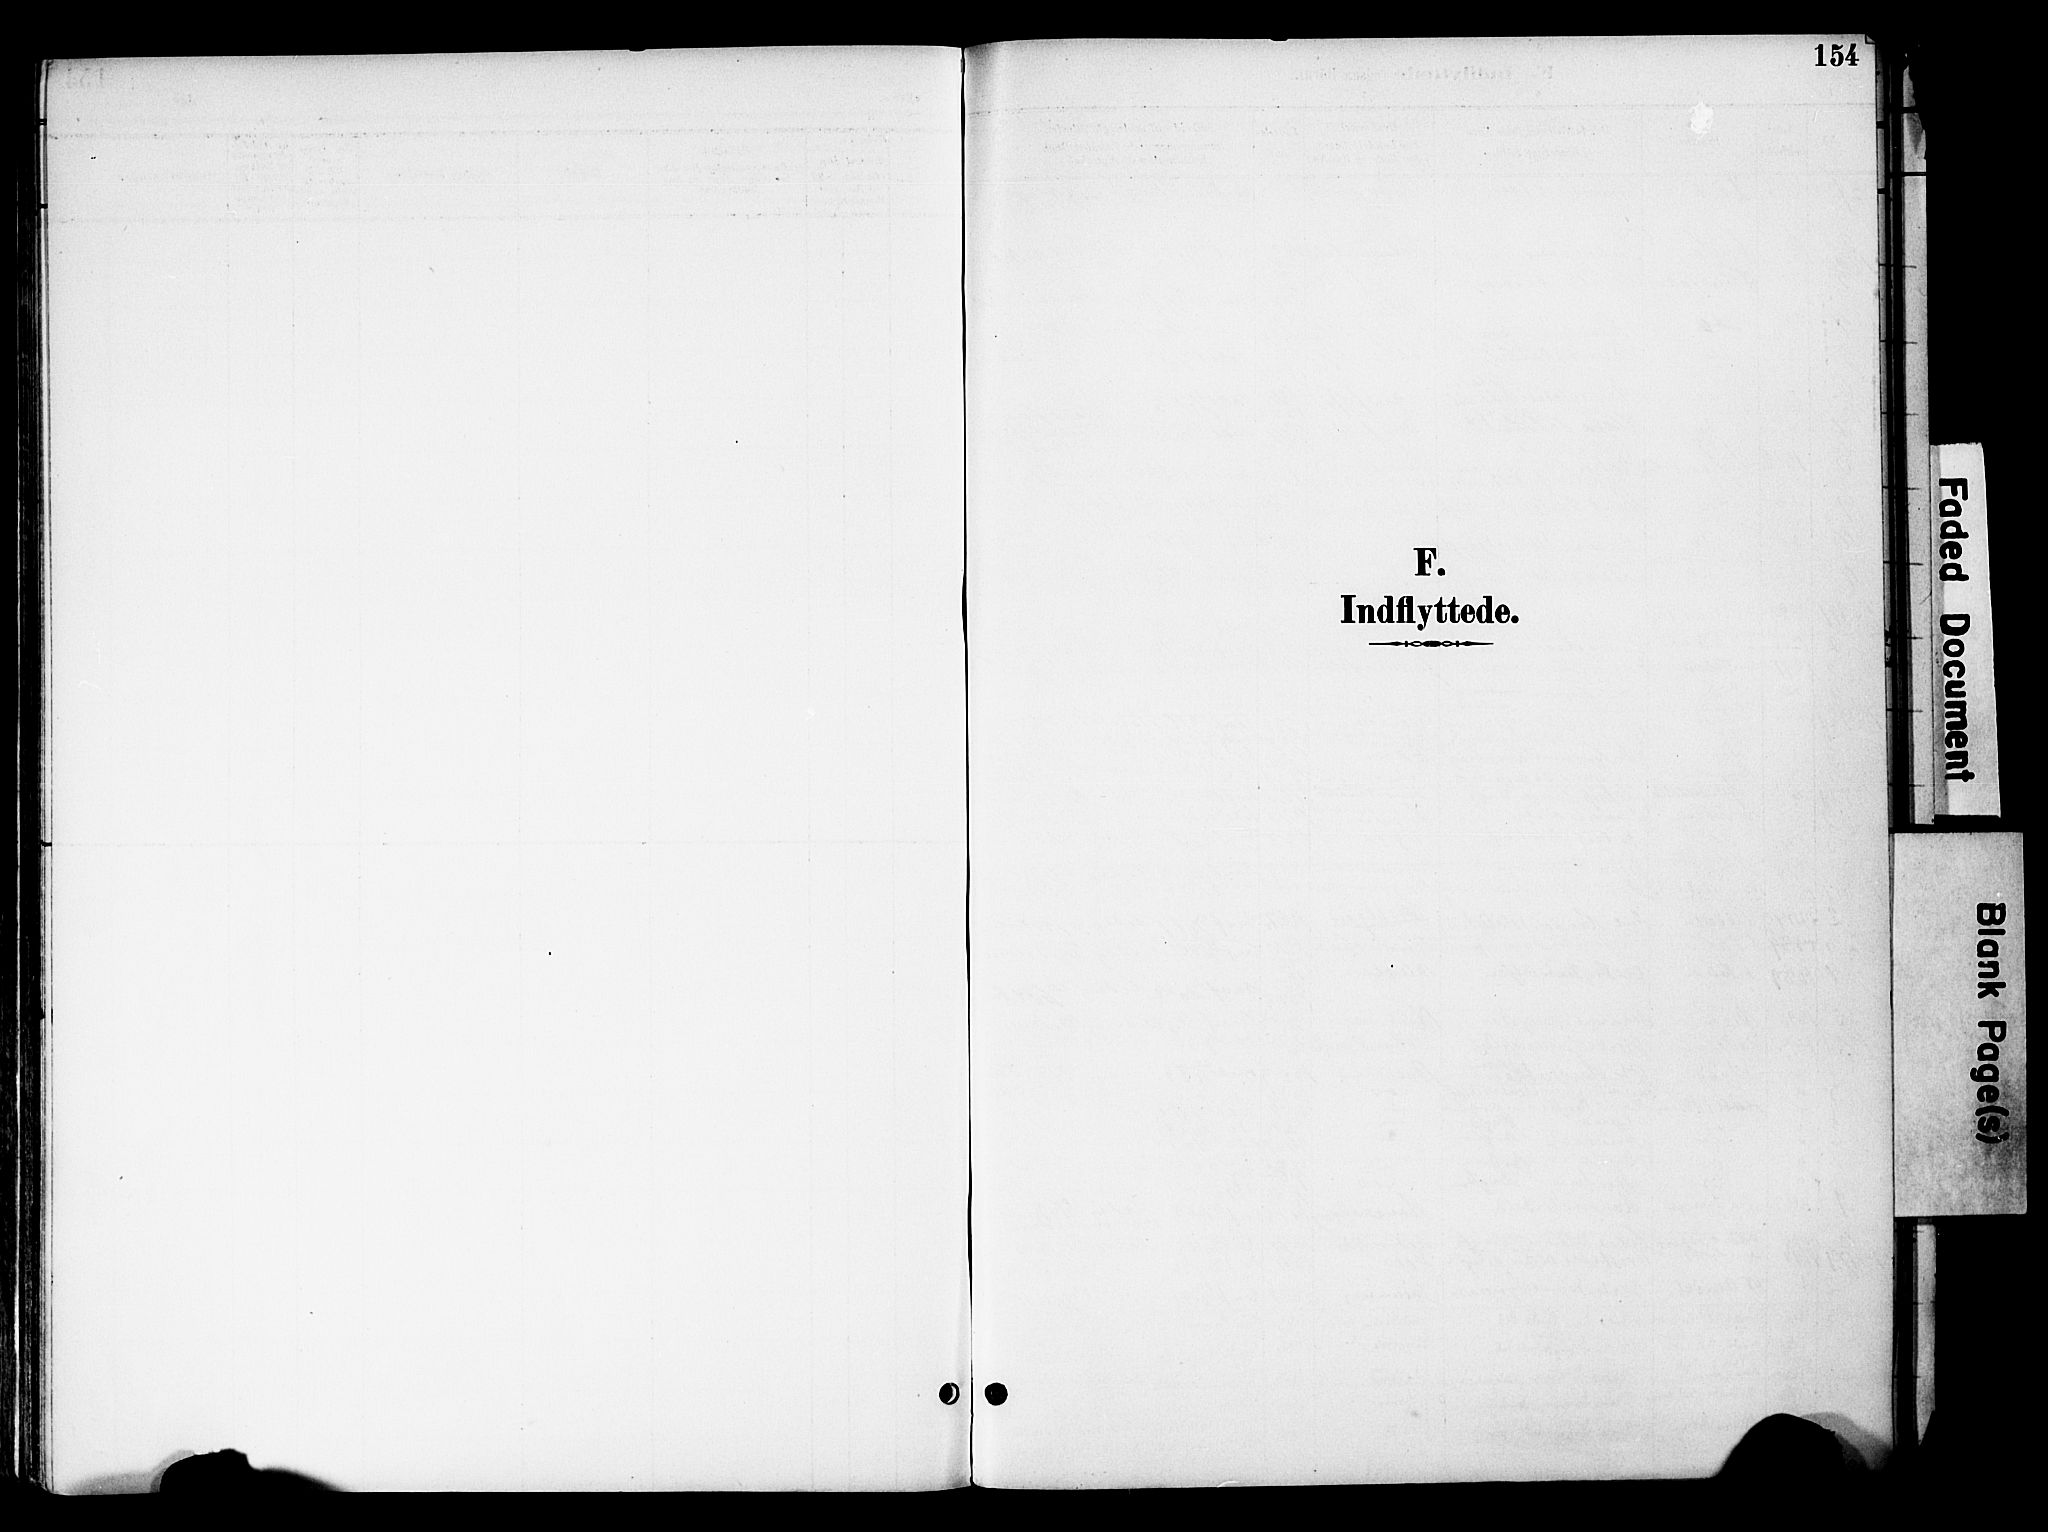 SAH, Gran prestekontor, Parish register (official) no. 20, 1889-1899, p. 154